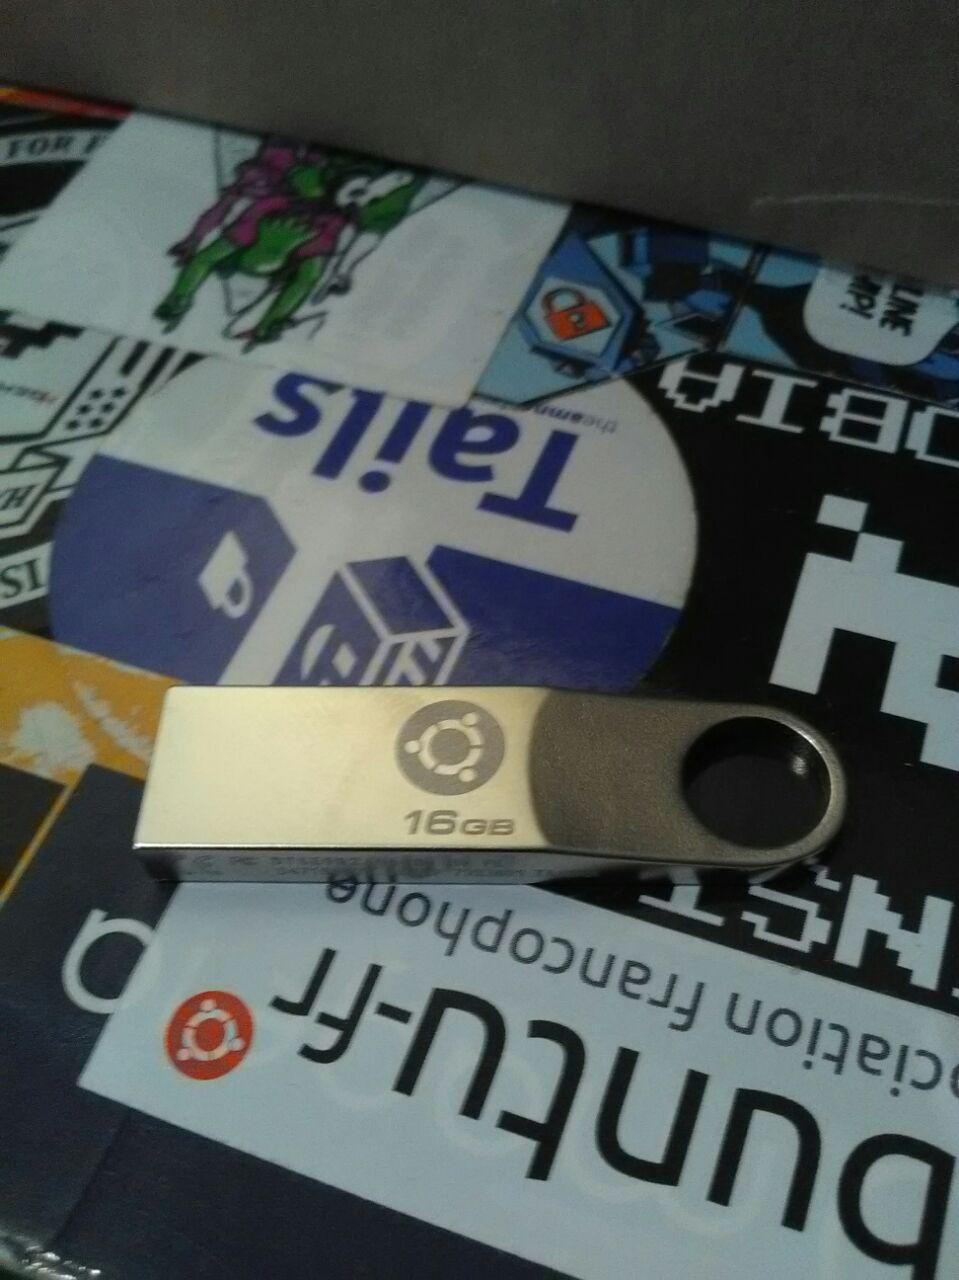 Ubuntu-fr USB key with engraved COF